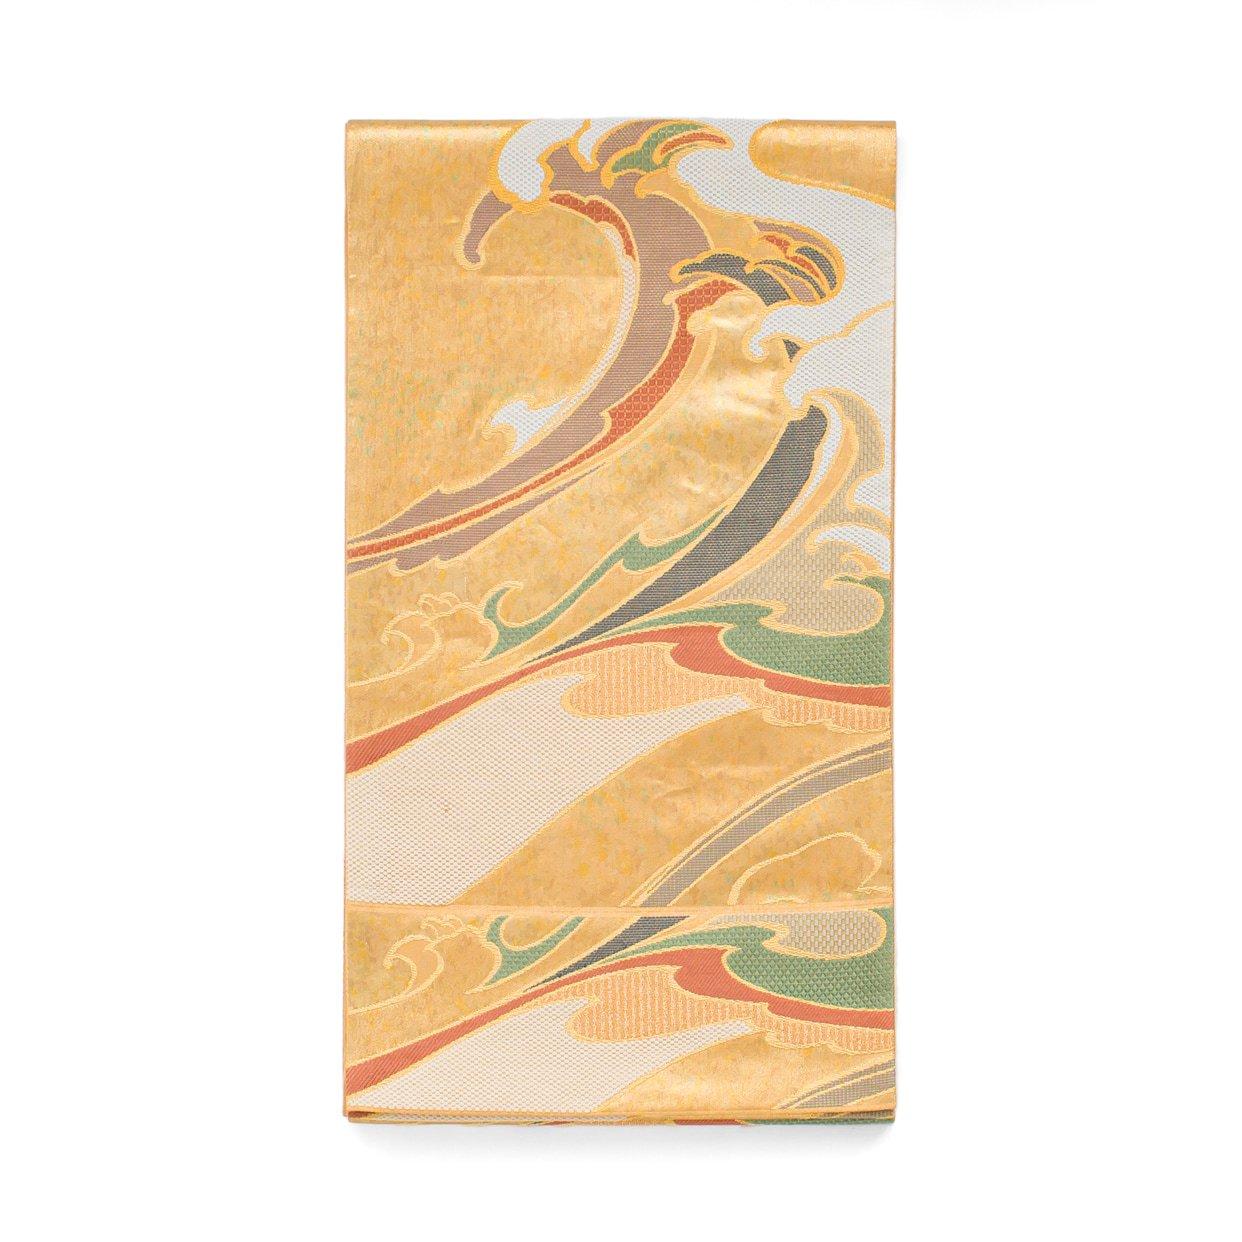 「袋帯●金地 大波」の商品画像